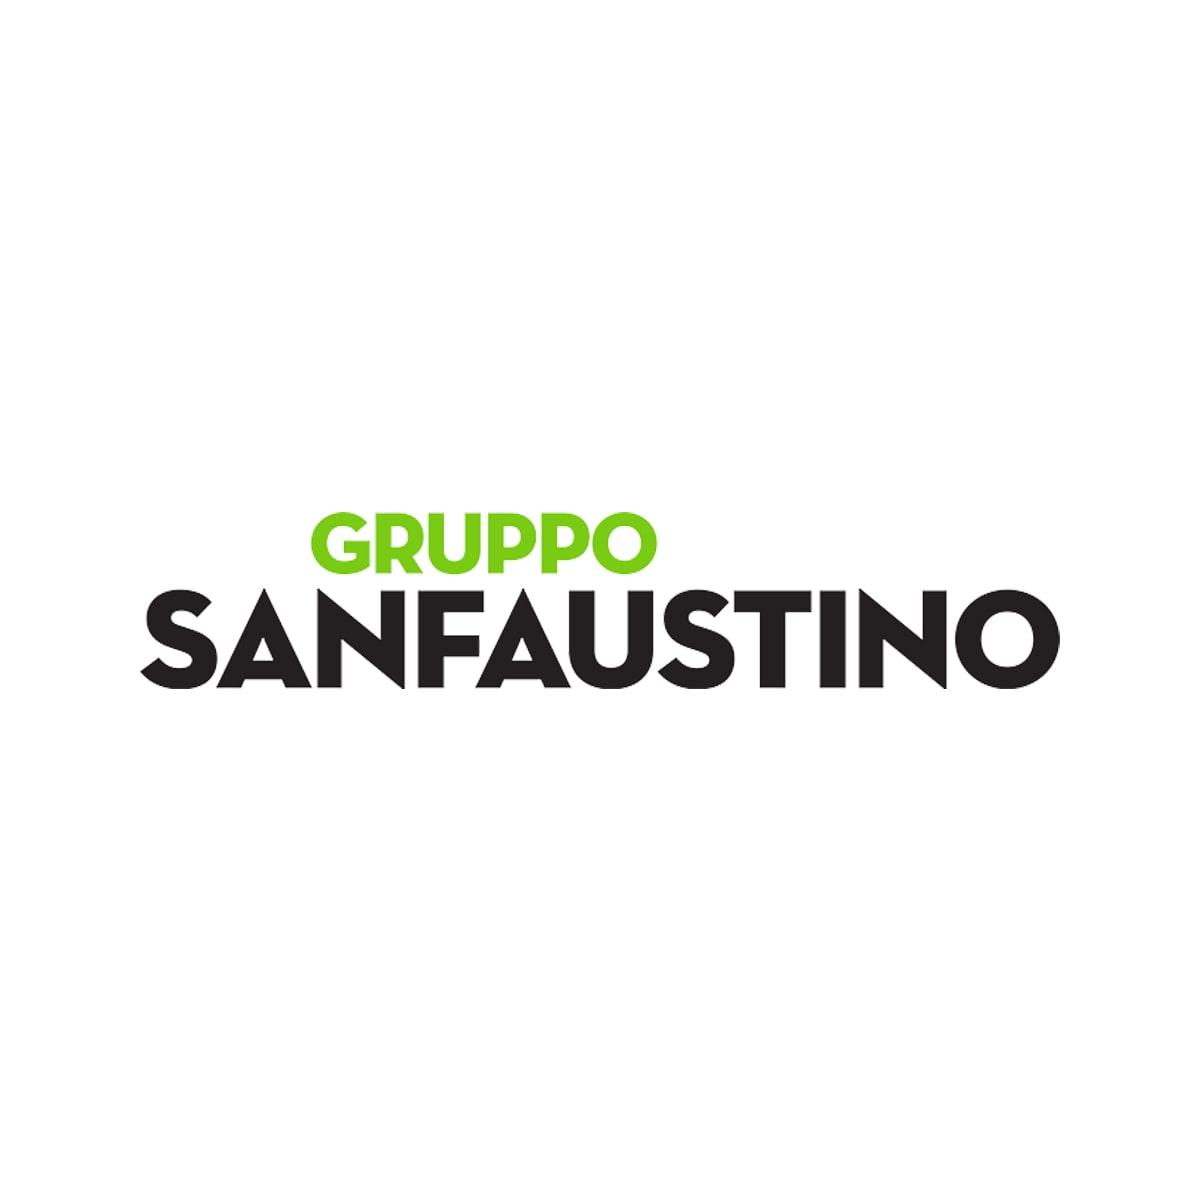 polygraphique-san-faustino_3